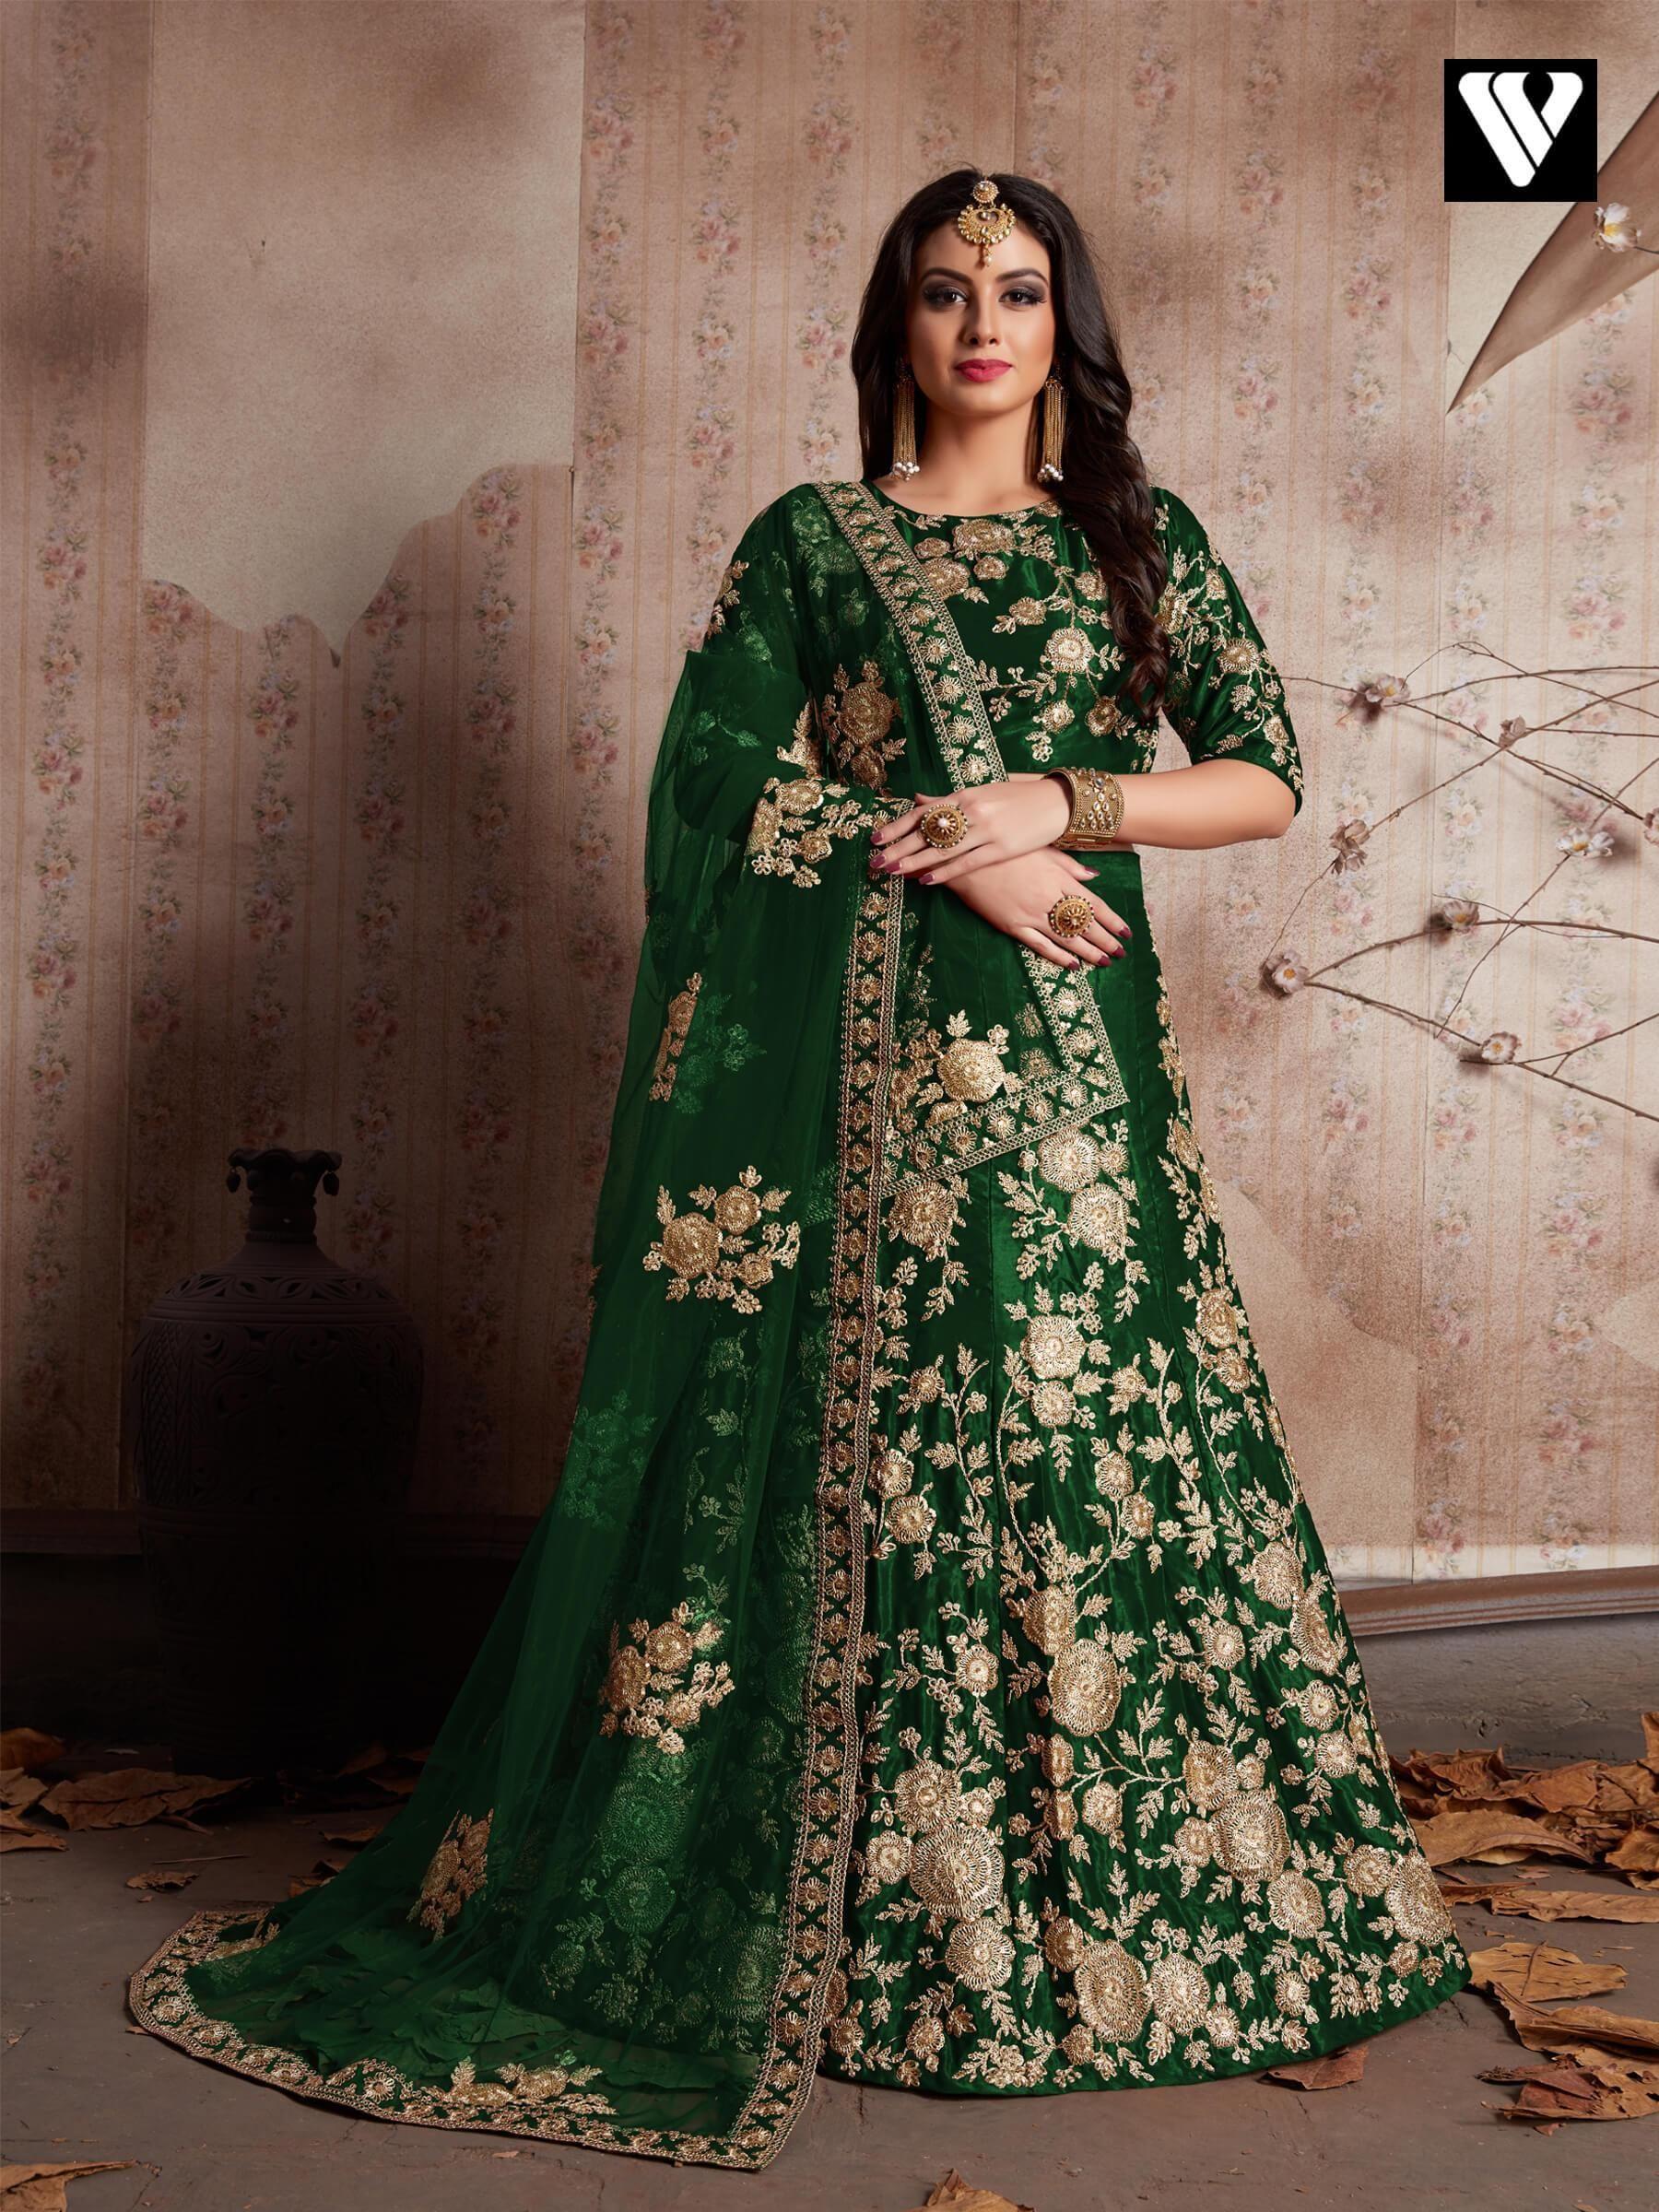 688551f3c2 Buy Dark Green Velvet Heavy Embroidered Traditional Lehenga Choli Online –  Vesture Vogue